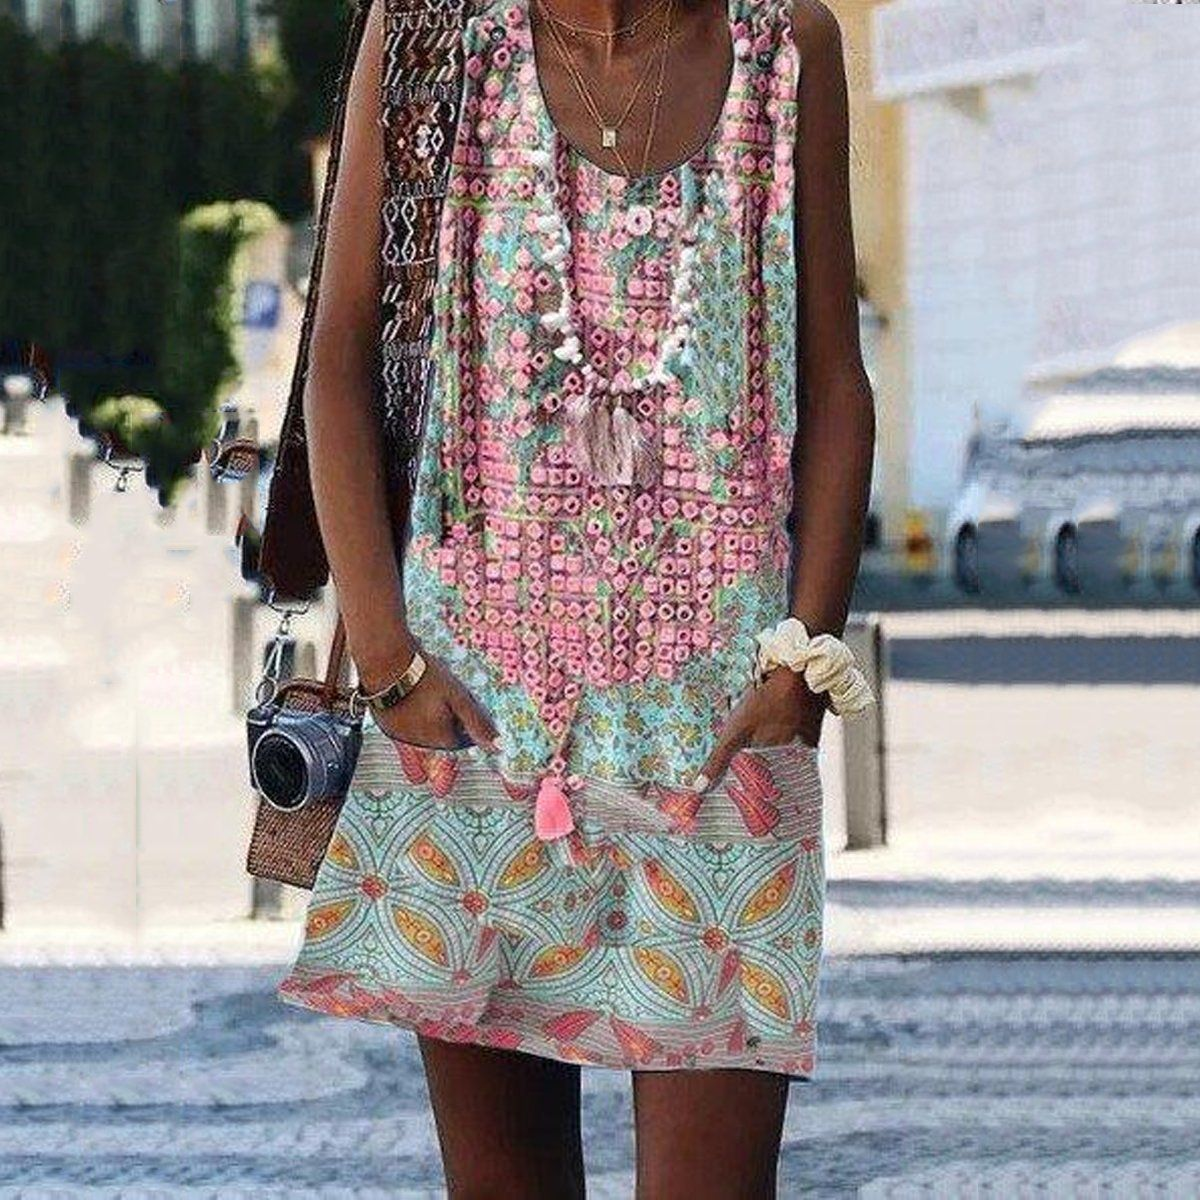 Crew Neck Casual Floral Print Sleeveless Summer Shift Dresses Klader [ 1200 x 1200 Pixel ]